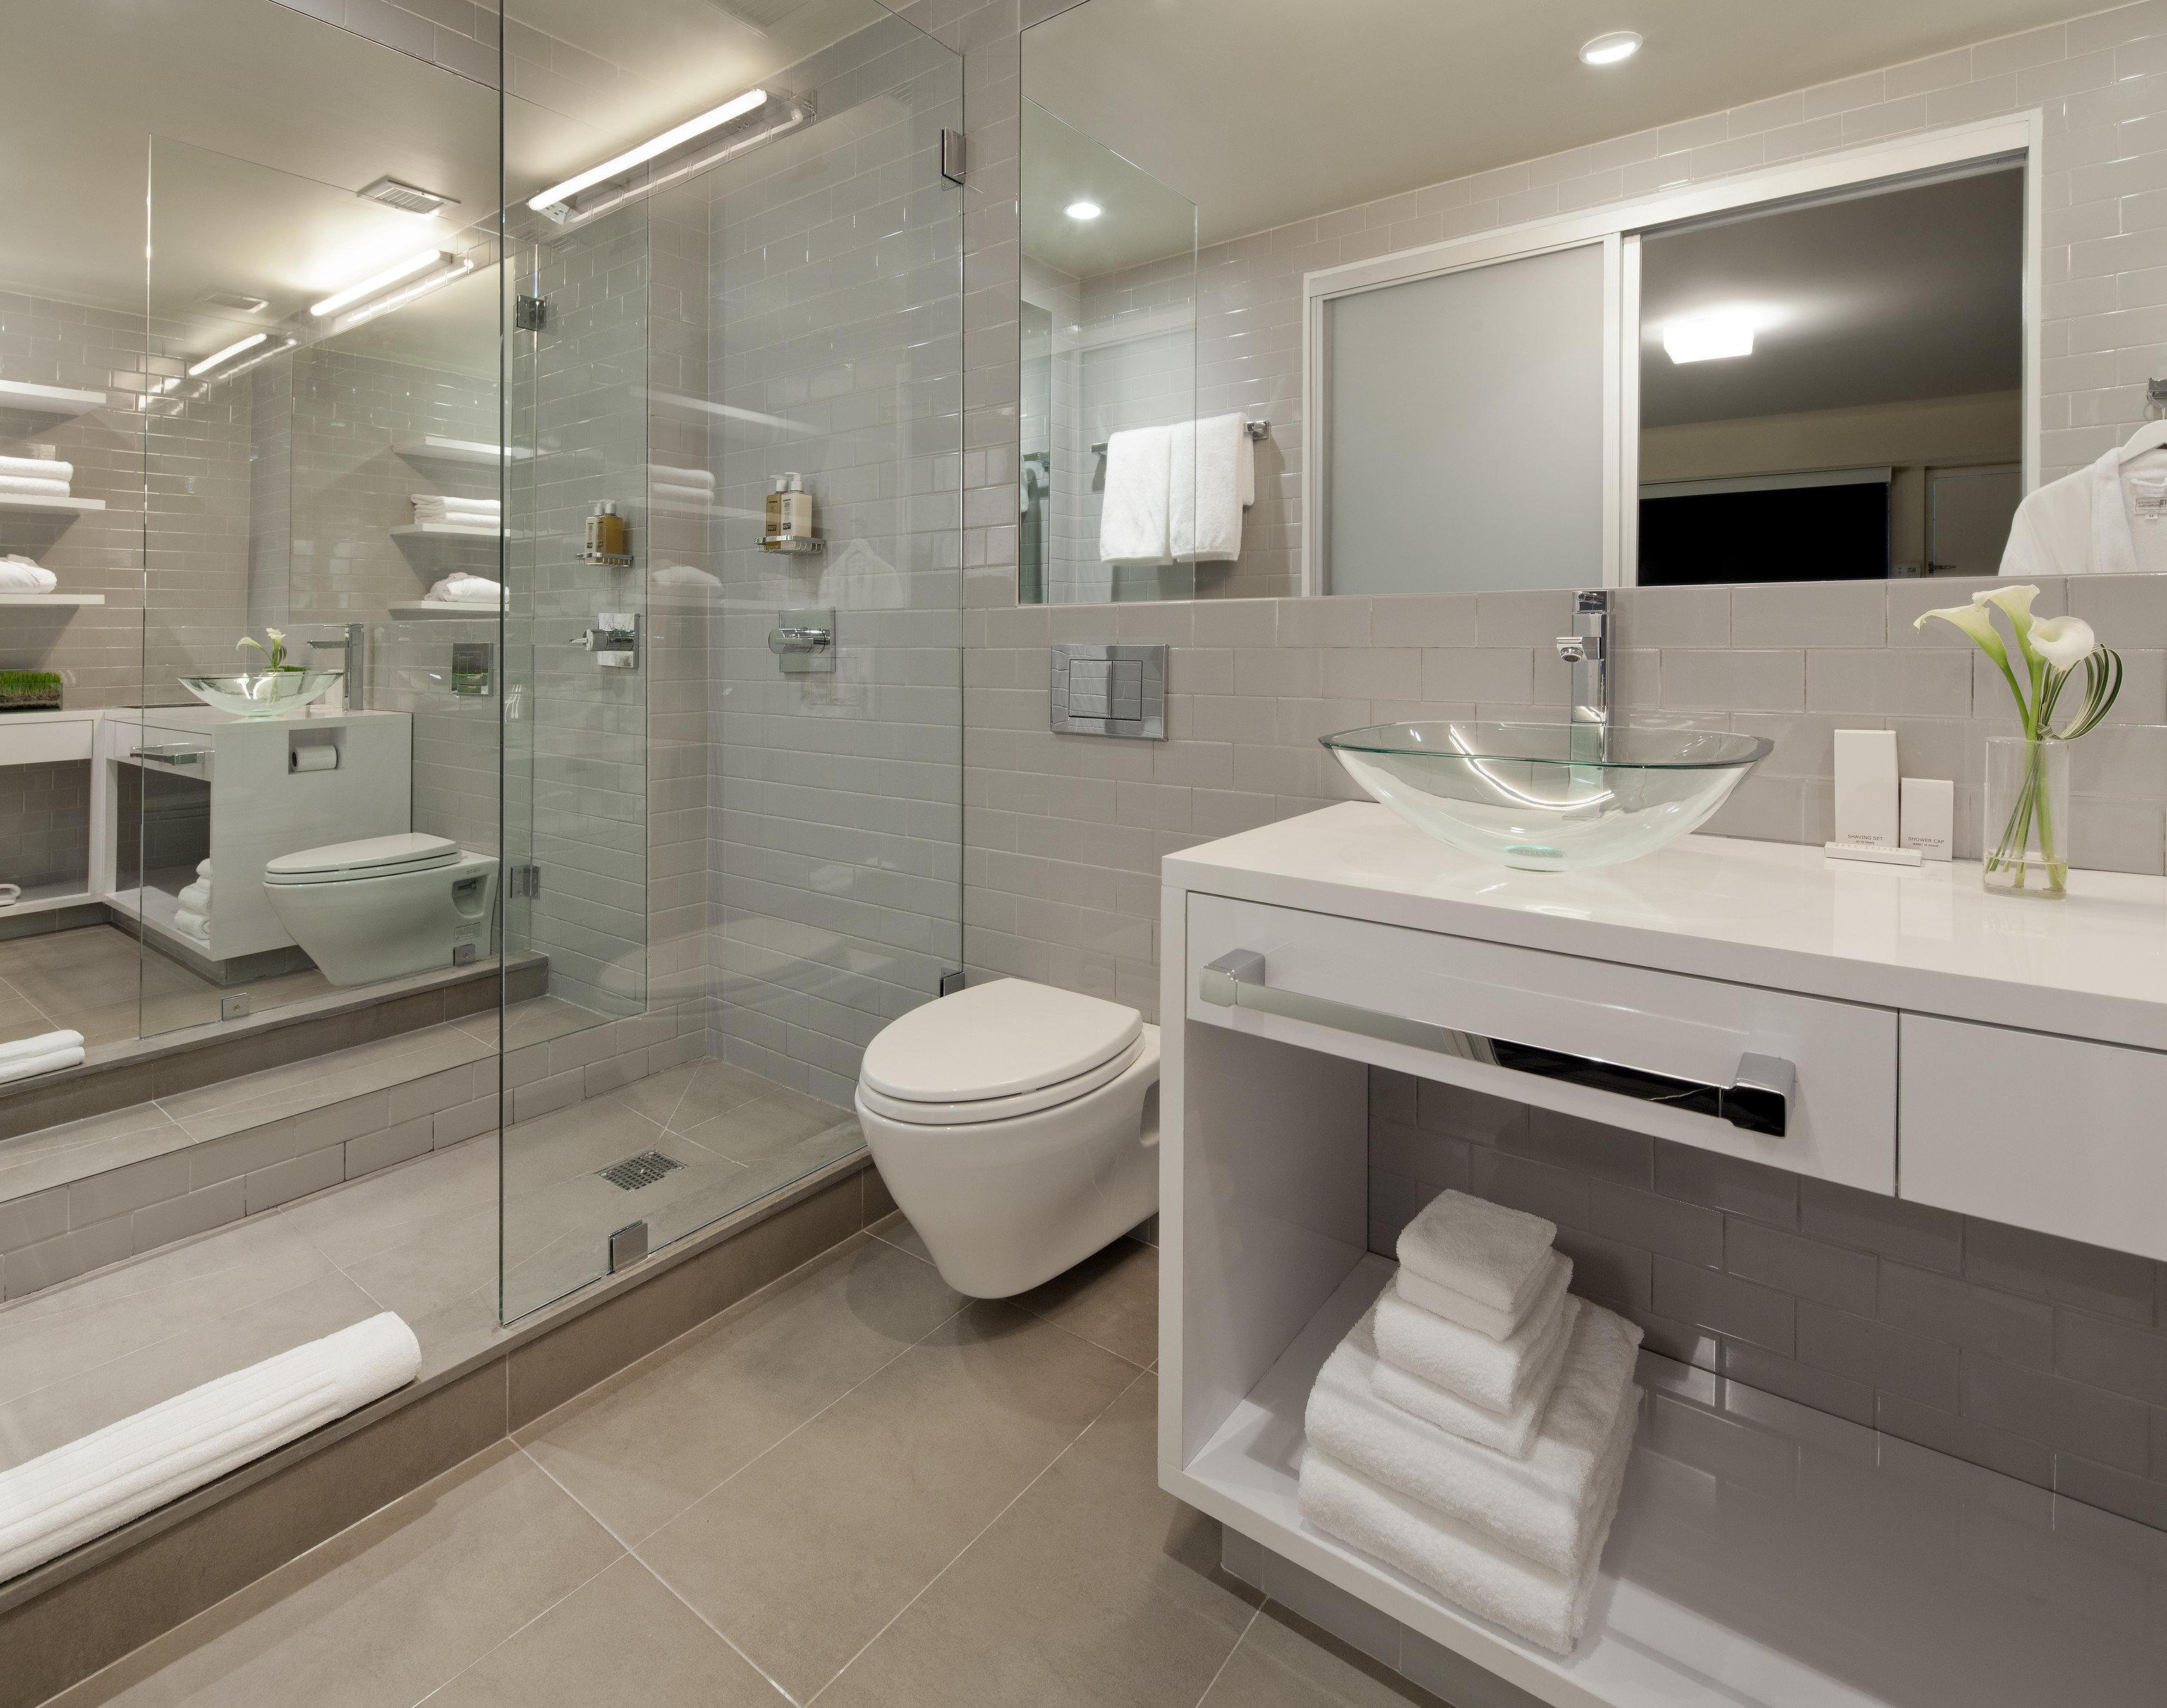 bathroom sink mirror property home flooring toilet bidet tub tile